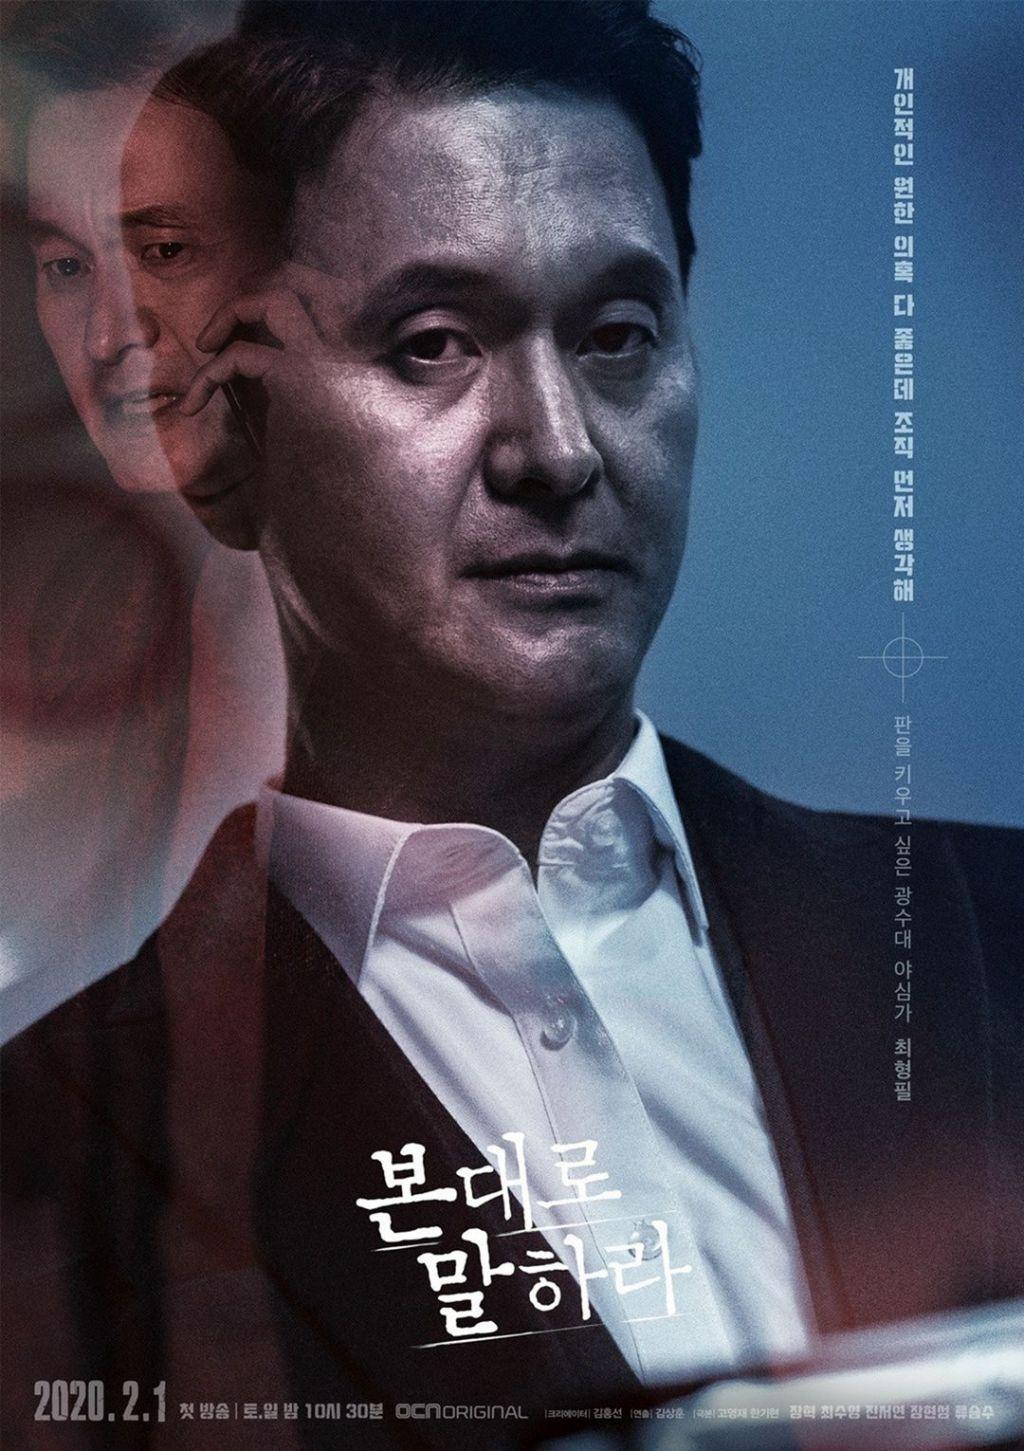 Jang Hyun Sung sebagai Choi Hyung Pil